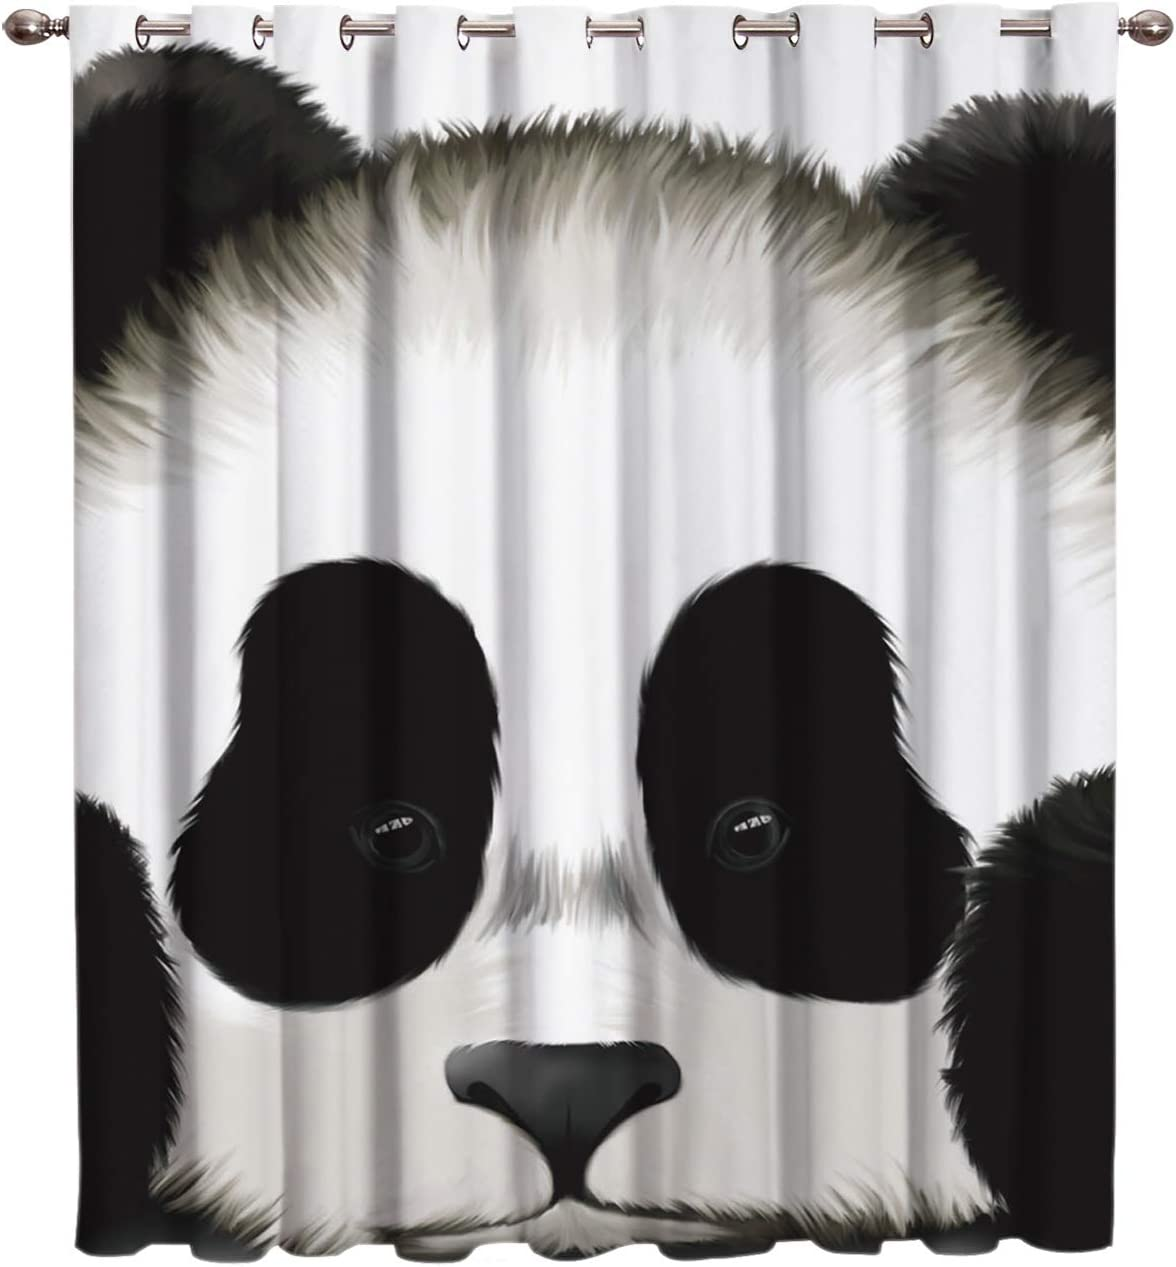 Cloud Dream Home Cute Cartoon 最安値に挑戦 今季も再入荷 Window-Tr Blackout Panda Darkening